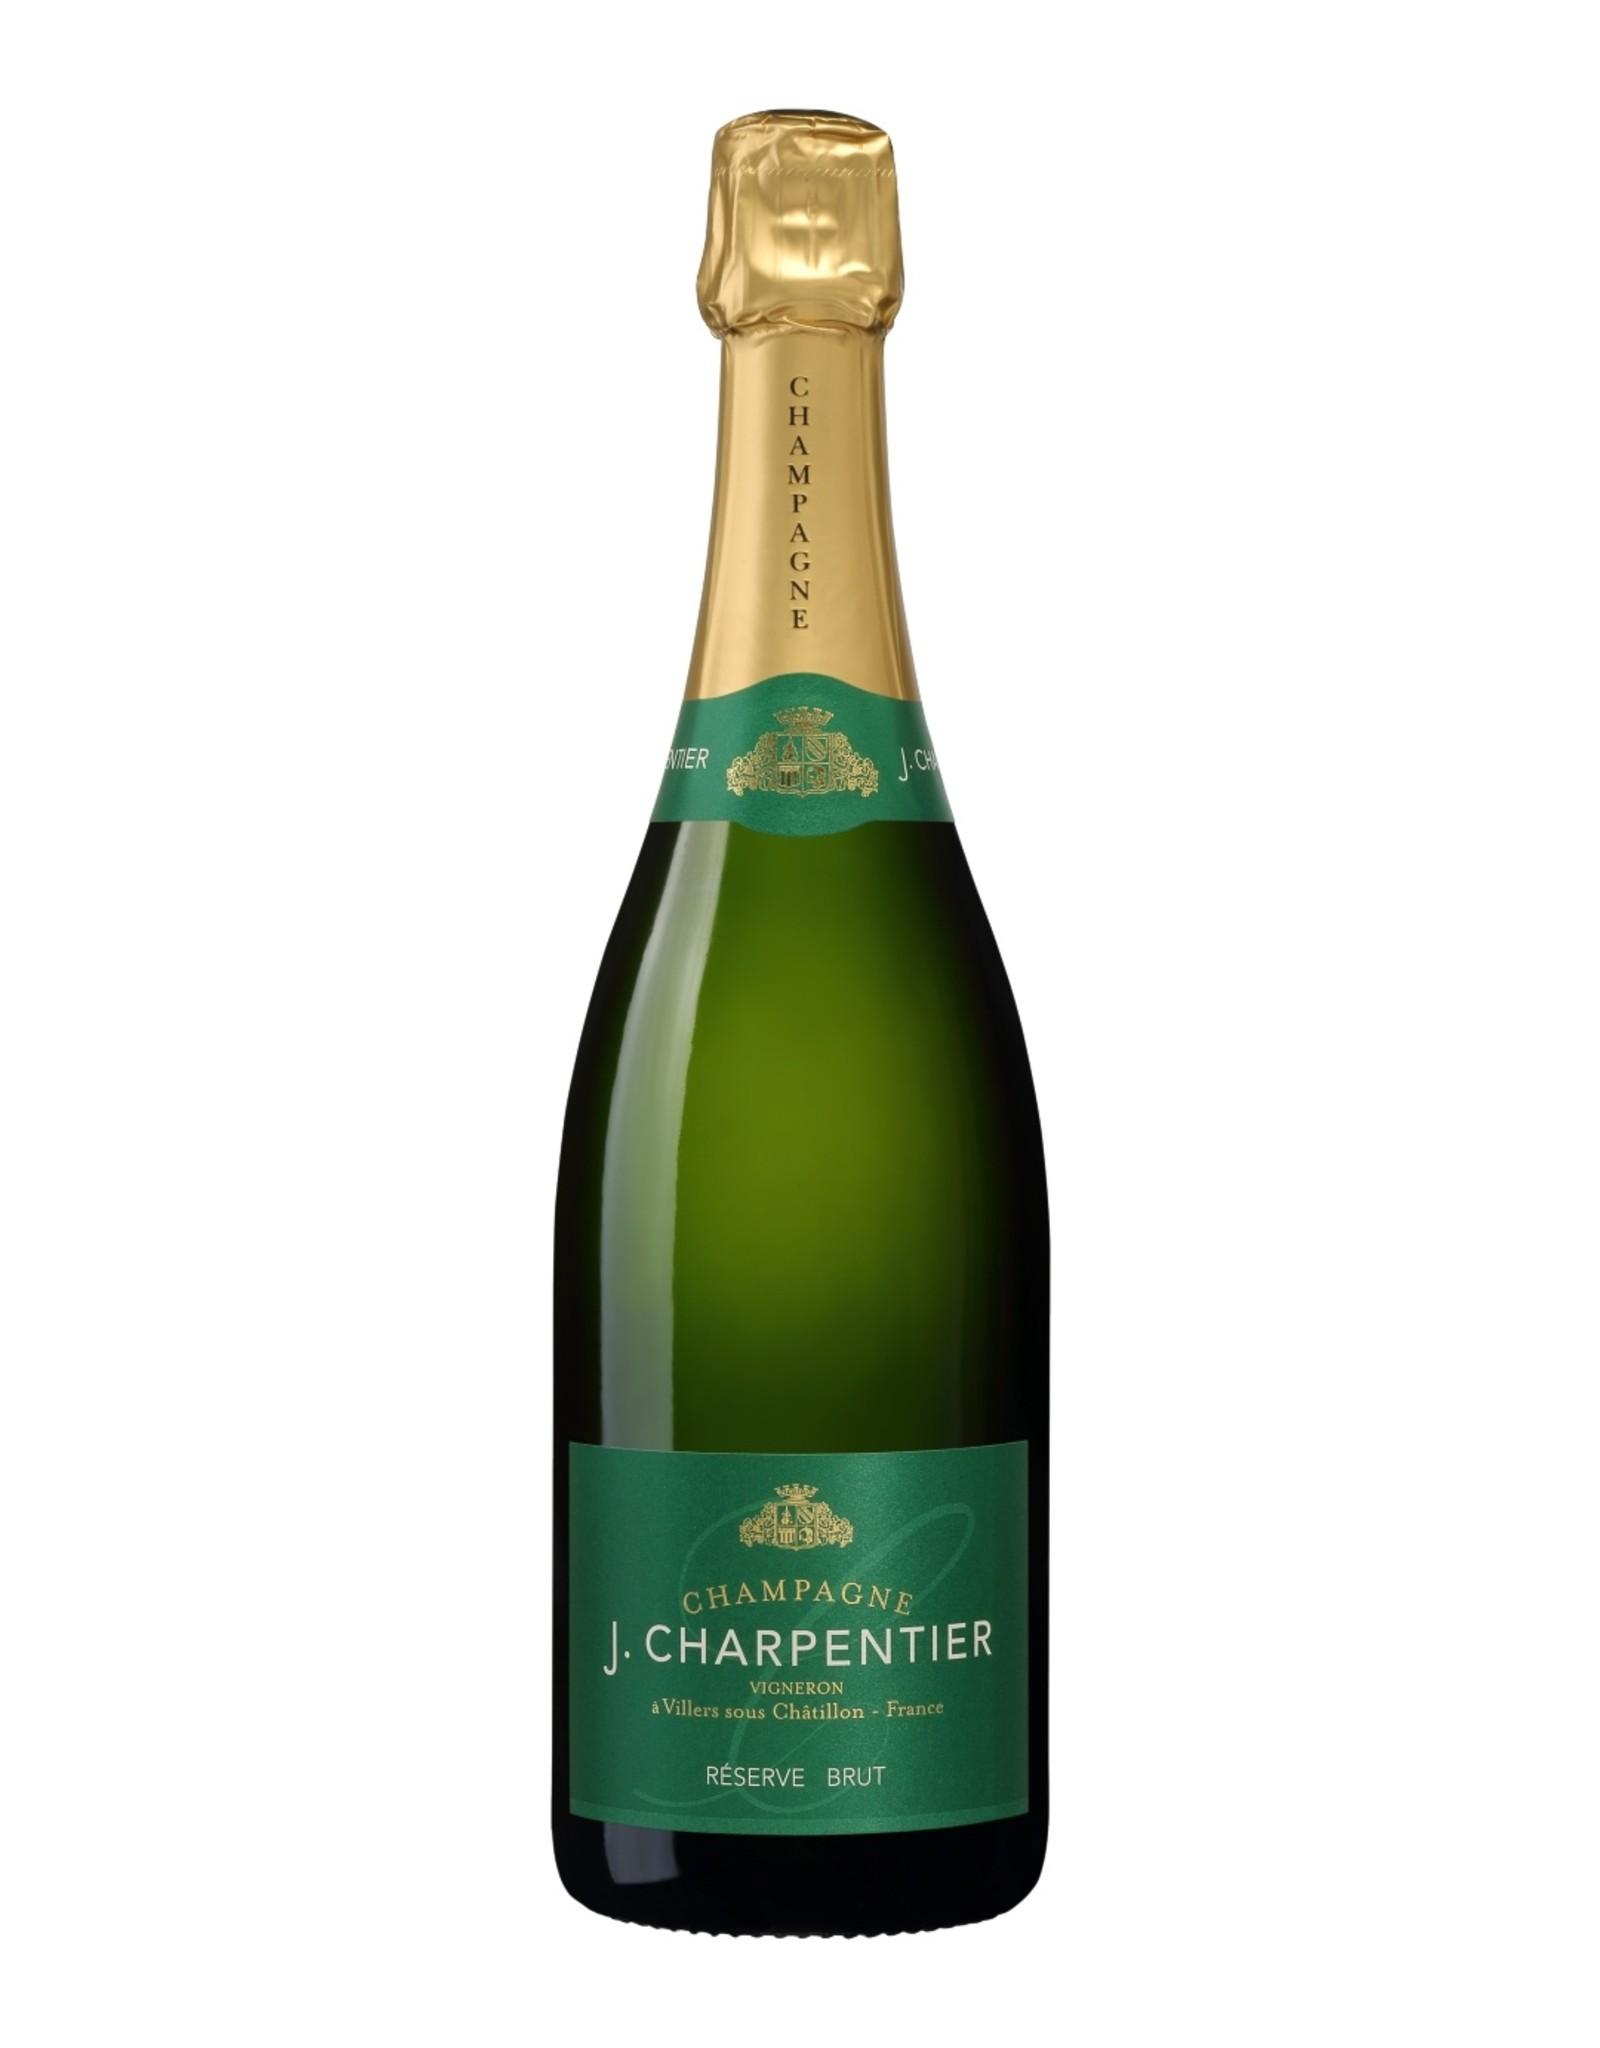 J. Charpentier Champagne J. Charpentier Reserve Brut - 1,5l